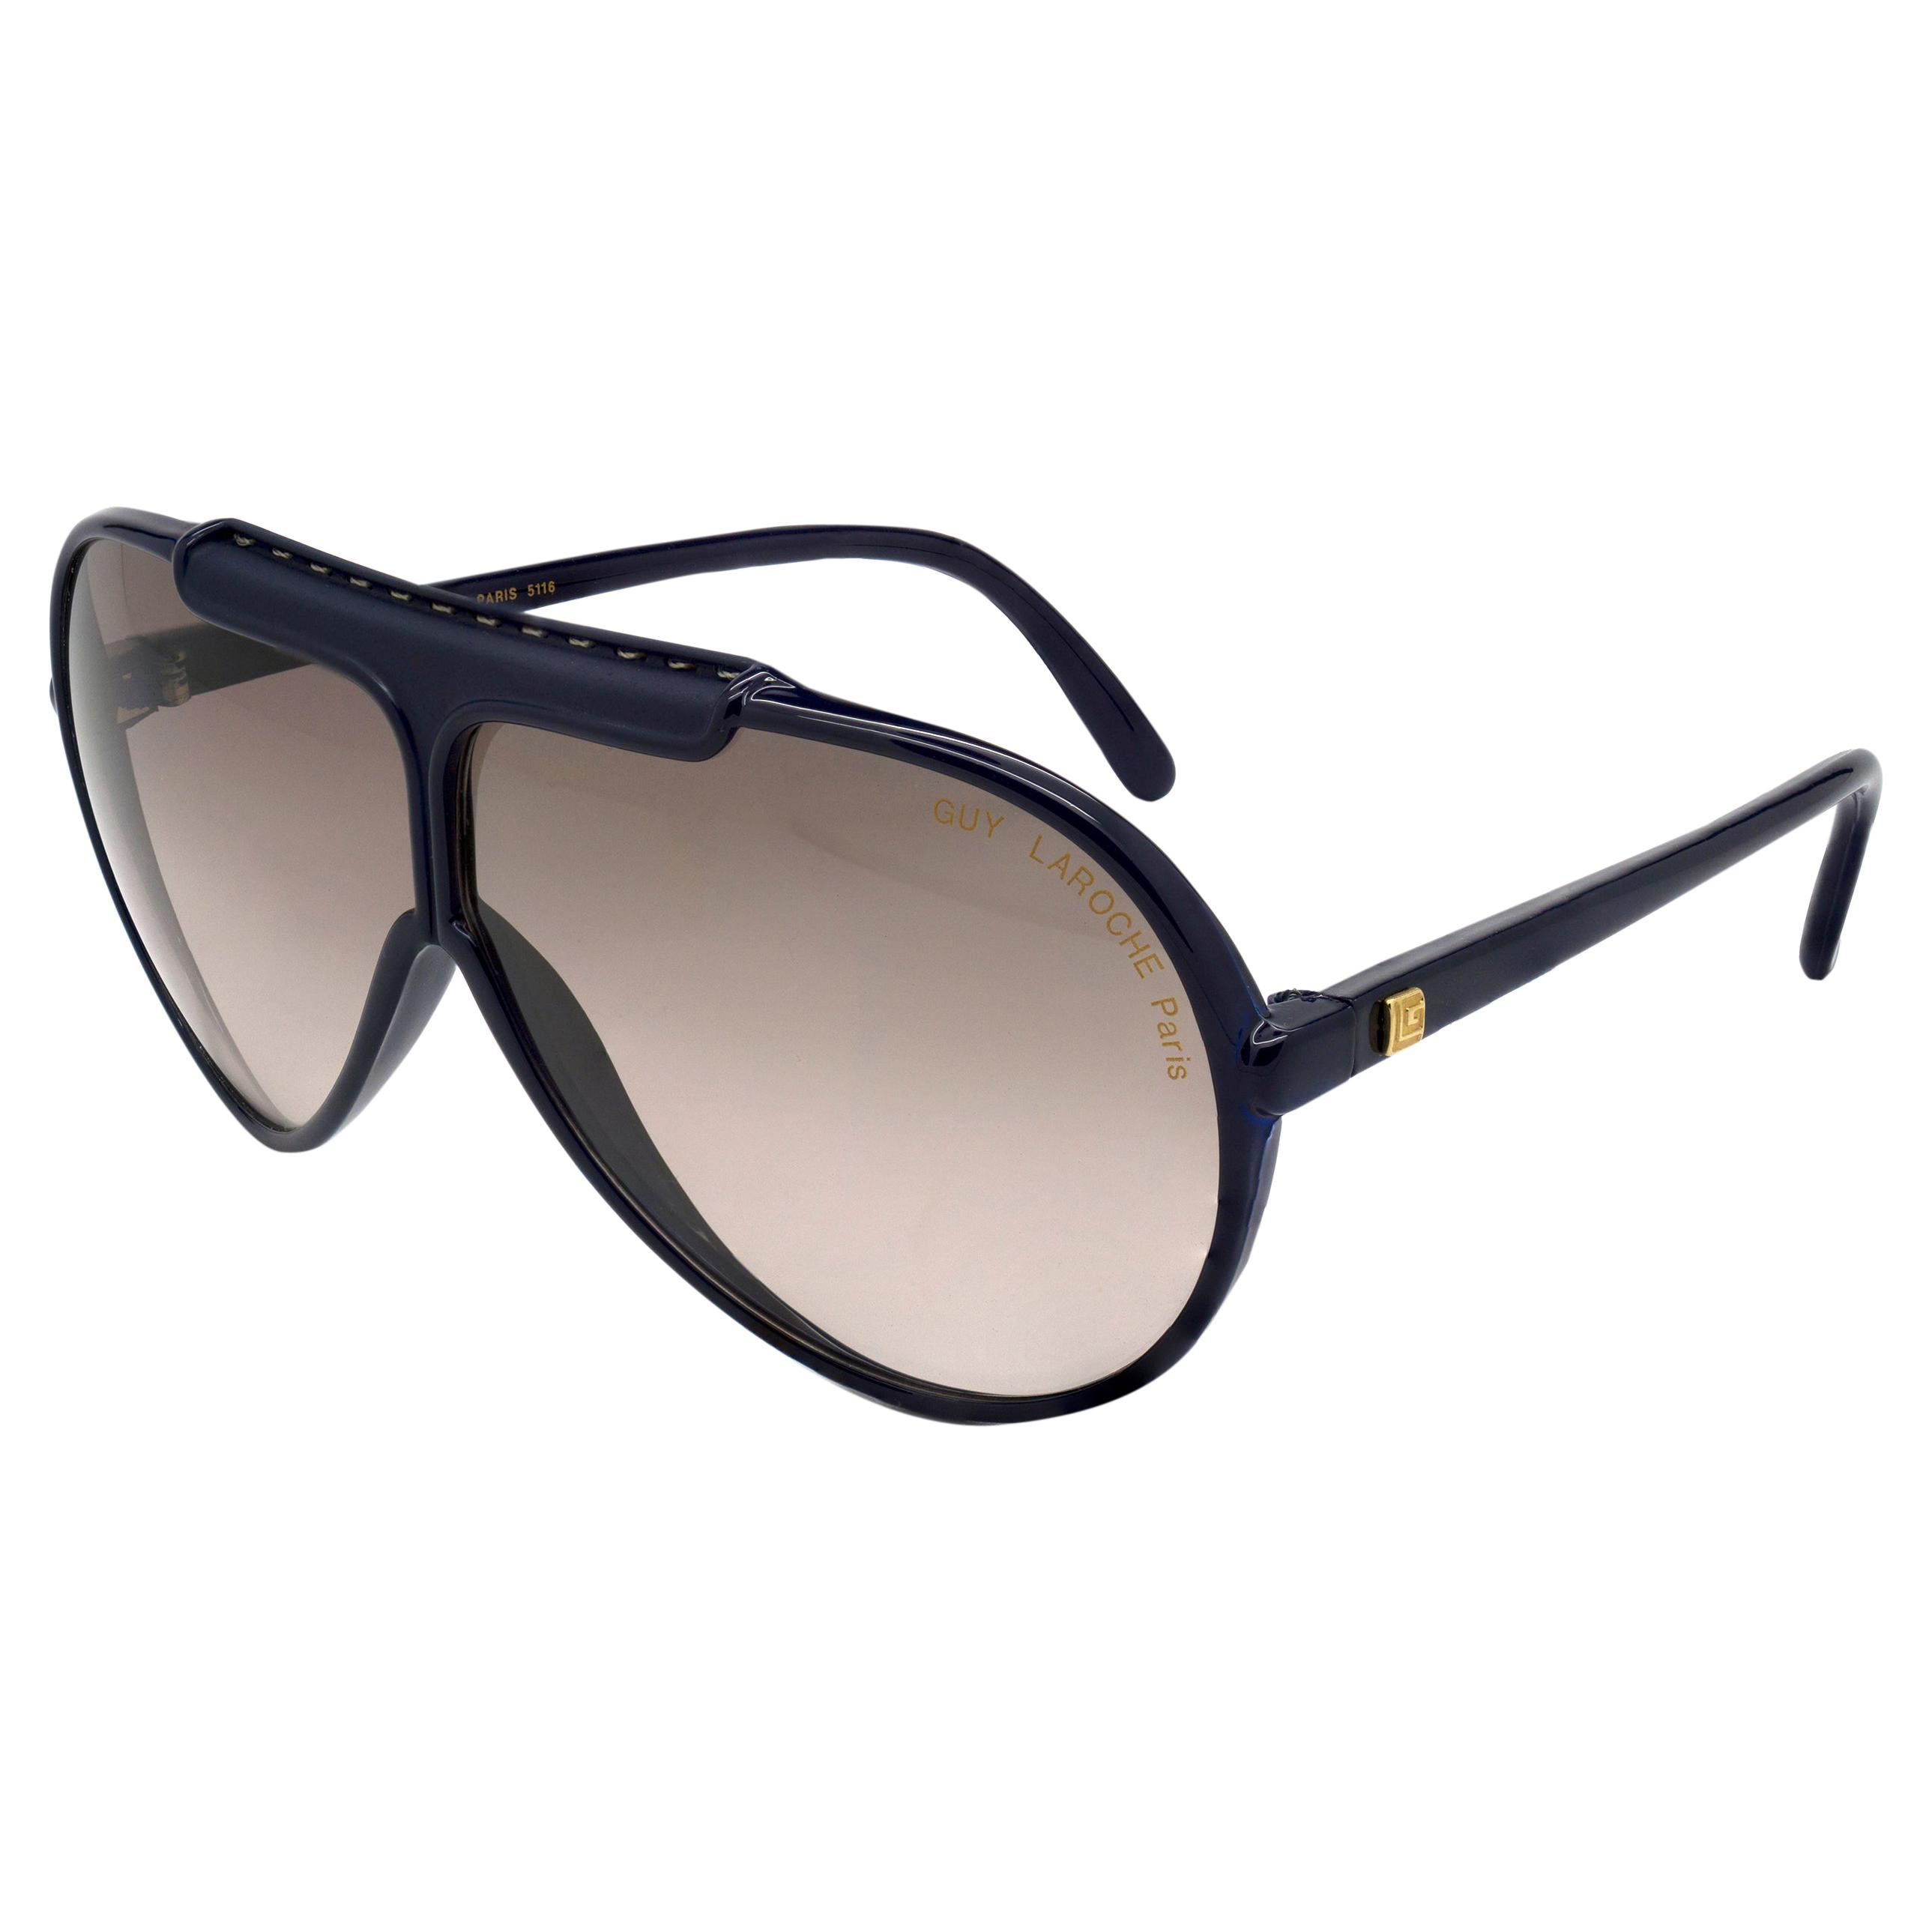 Guy Laroche vintage aviator sunglasses, France